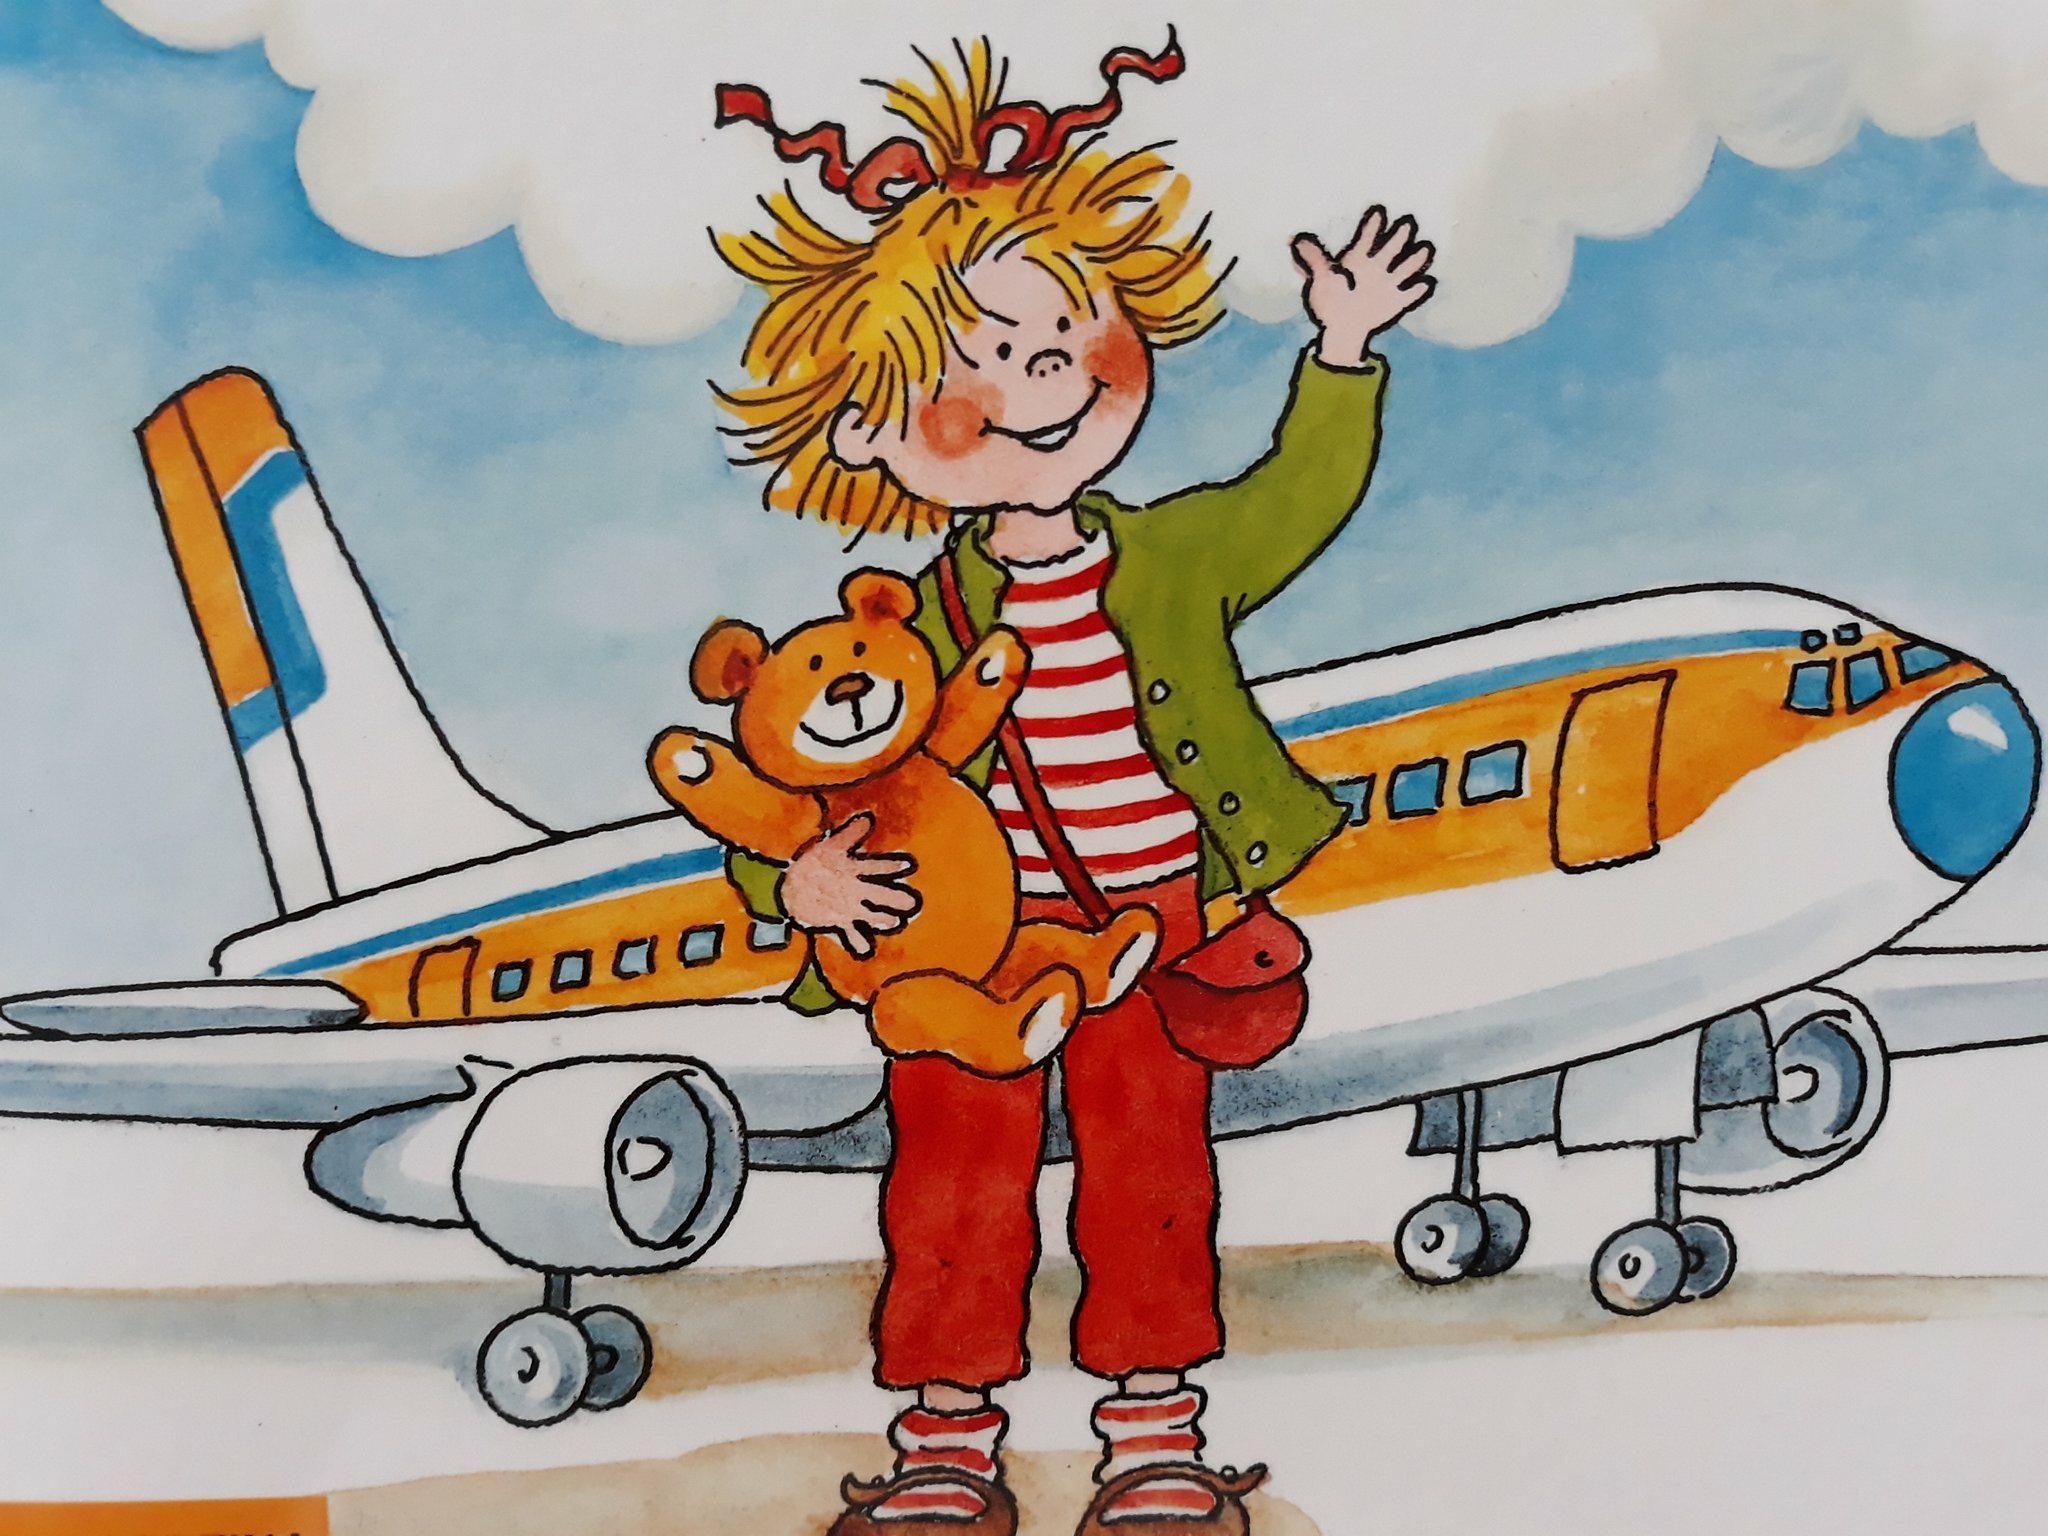 Zabawki do samolotu, co zabrać. Zuzia leci samolotem.